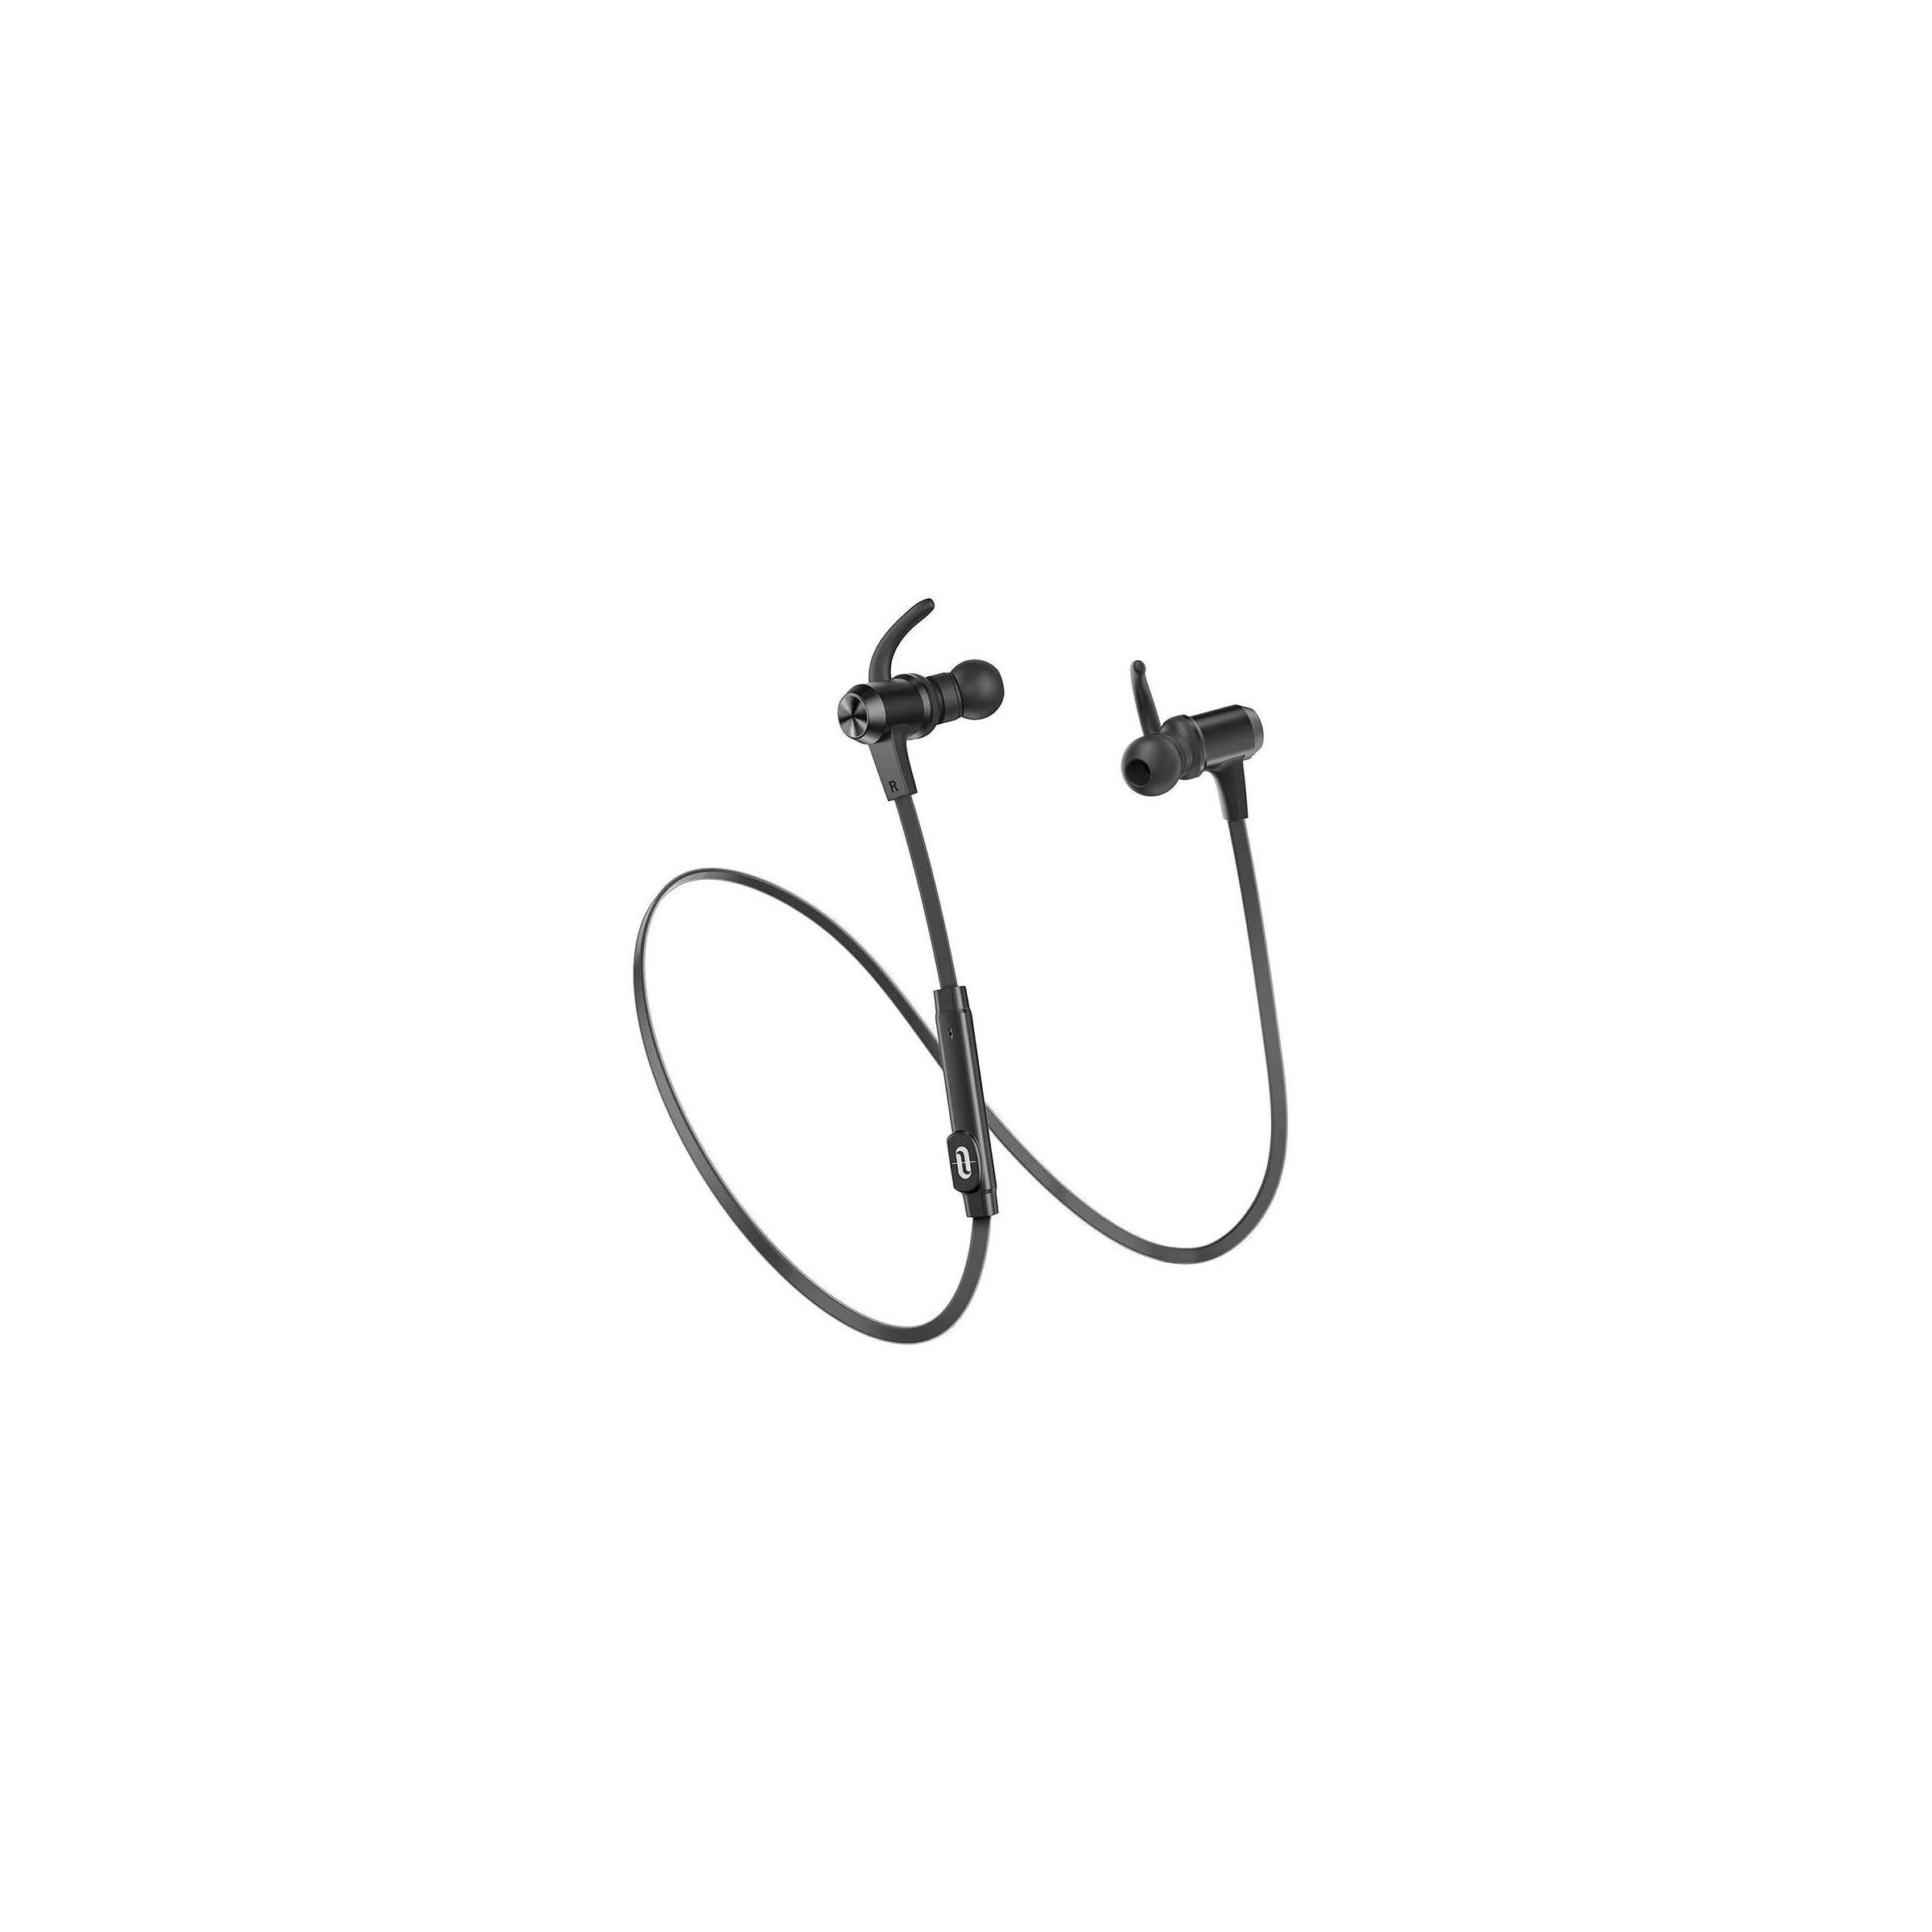 taotronics Taotronics bluetooth 5.0 headphones sweatproof trådløs earbuds sports på mackabler.dk